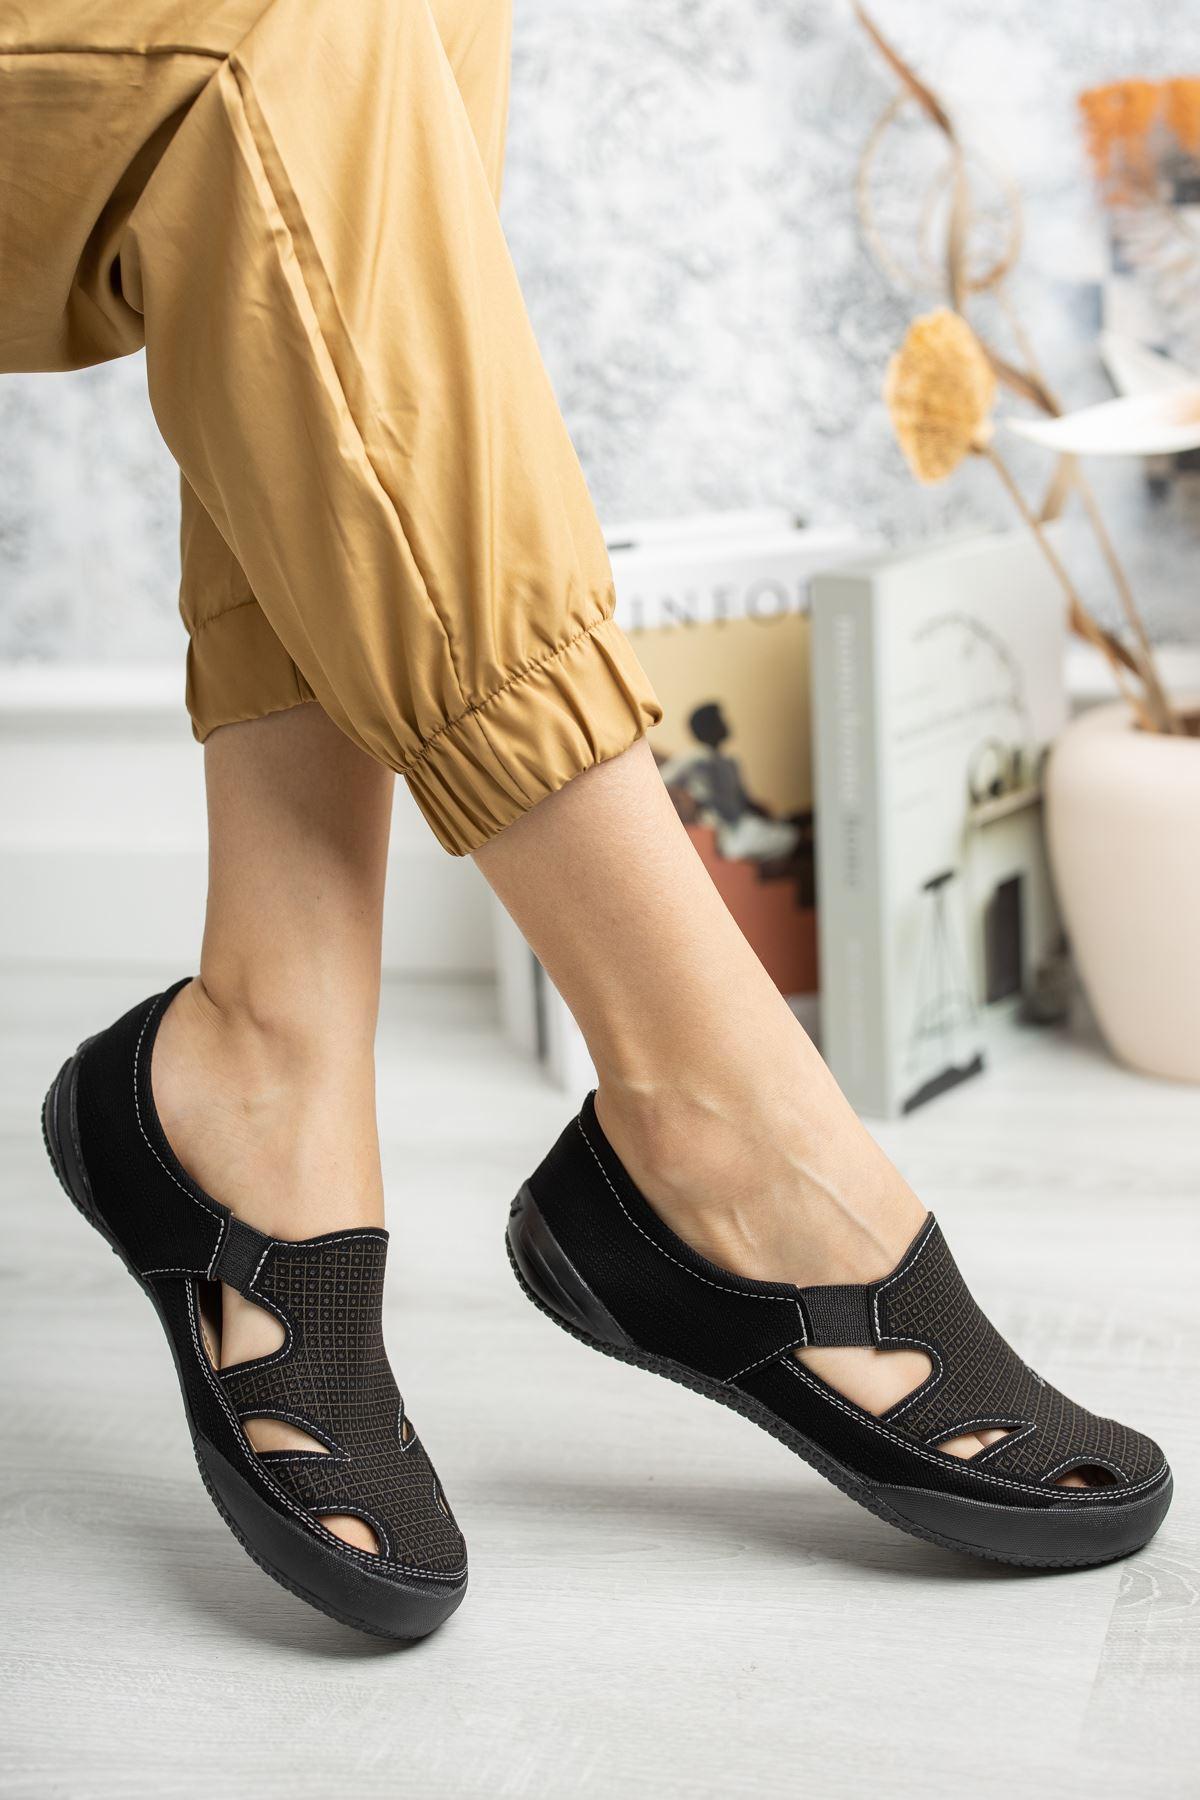 Ortapedik Pedli Lastikli Siyah Ayakkabı